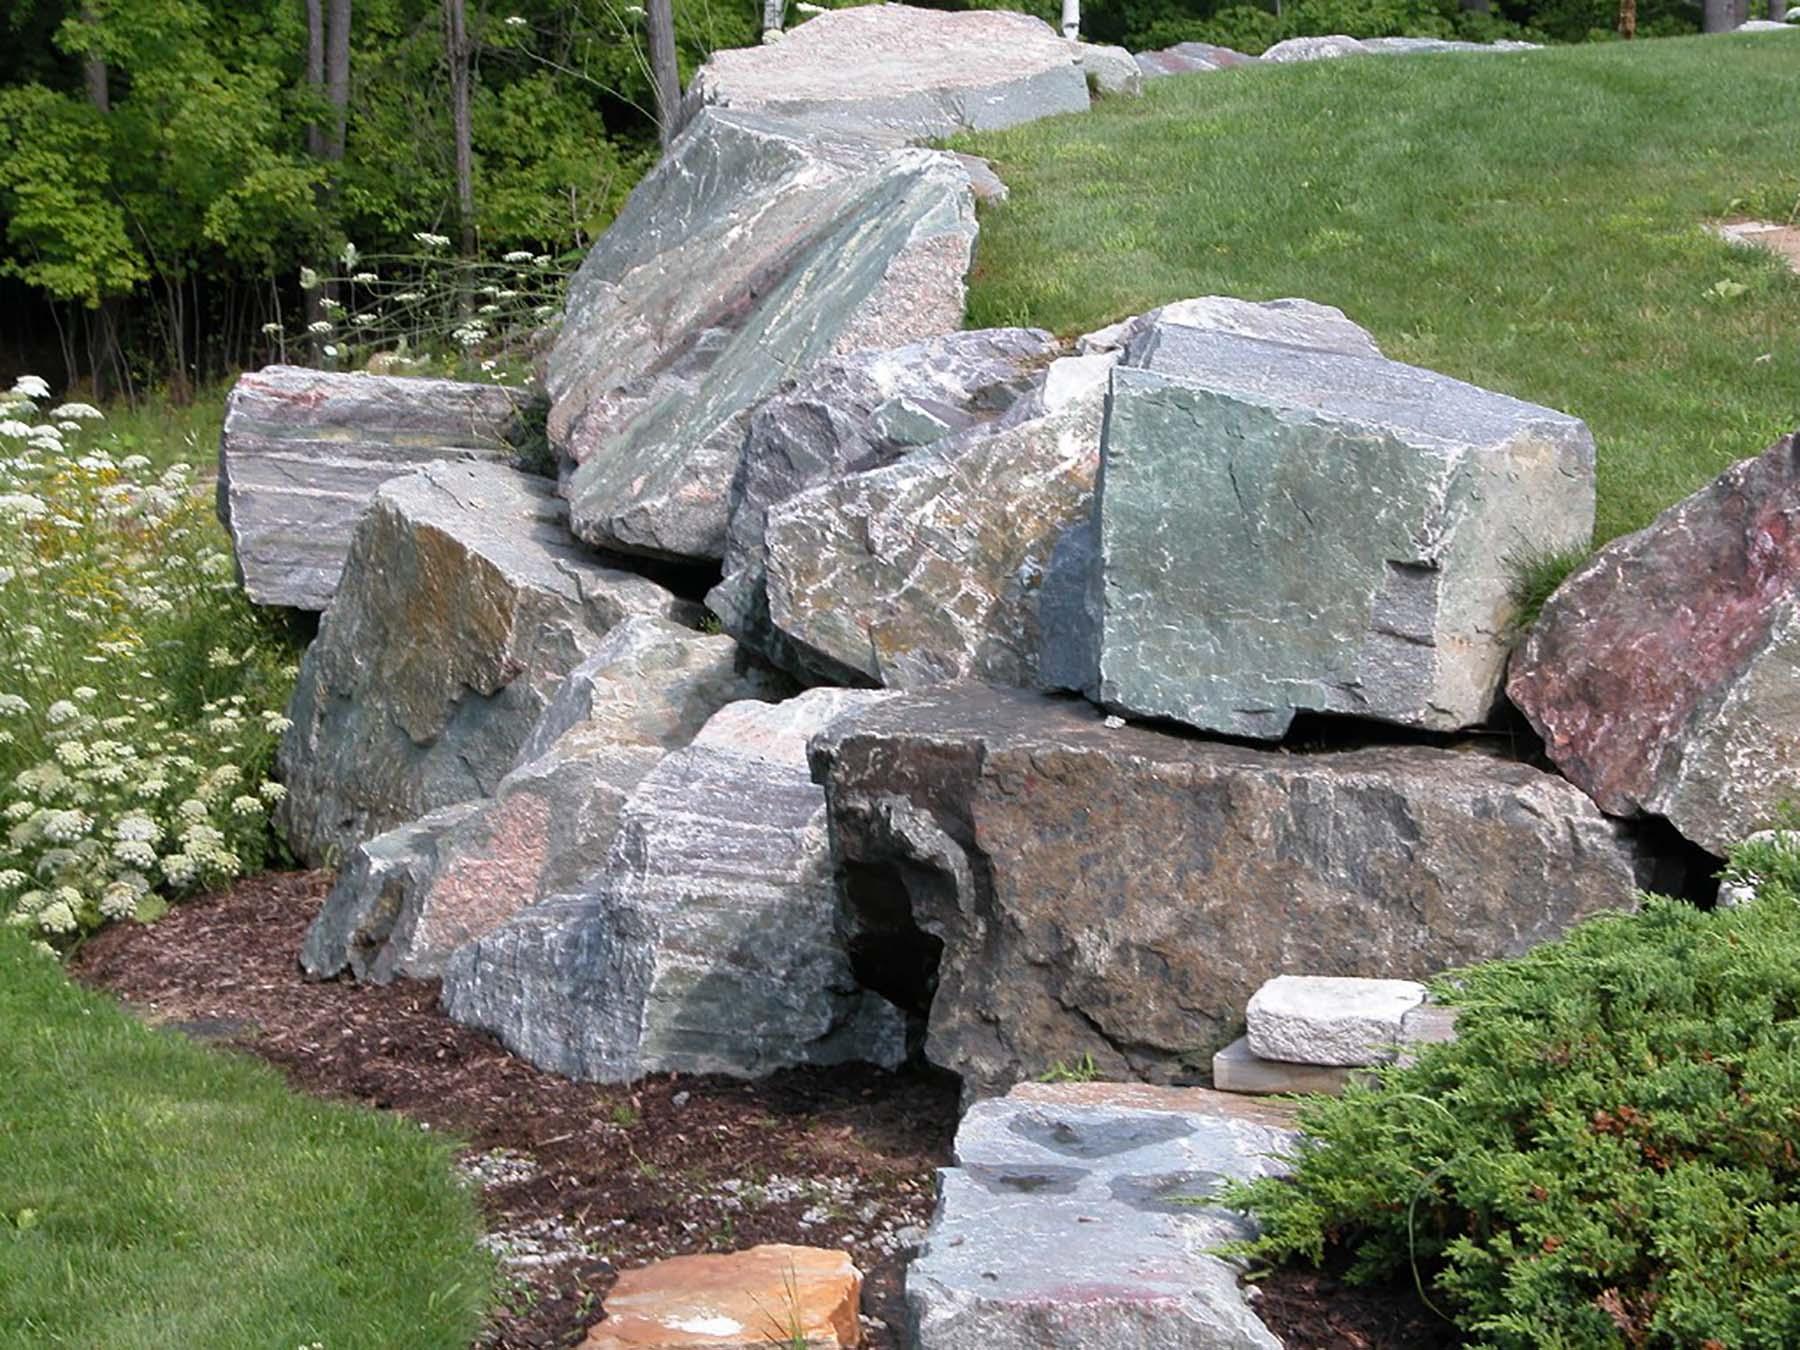 saratoga granite natural stone boulders outside